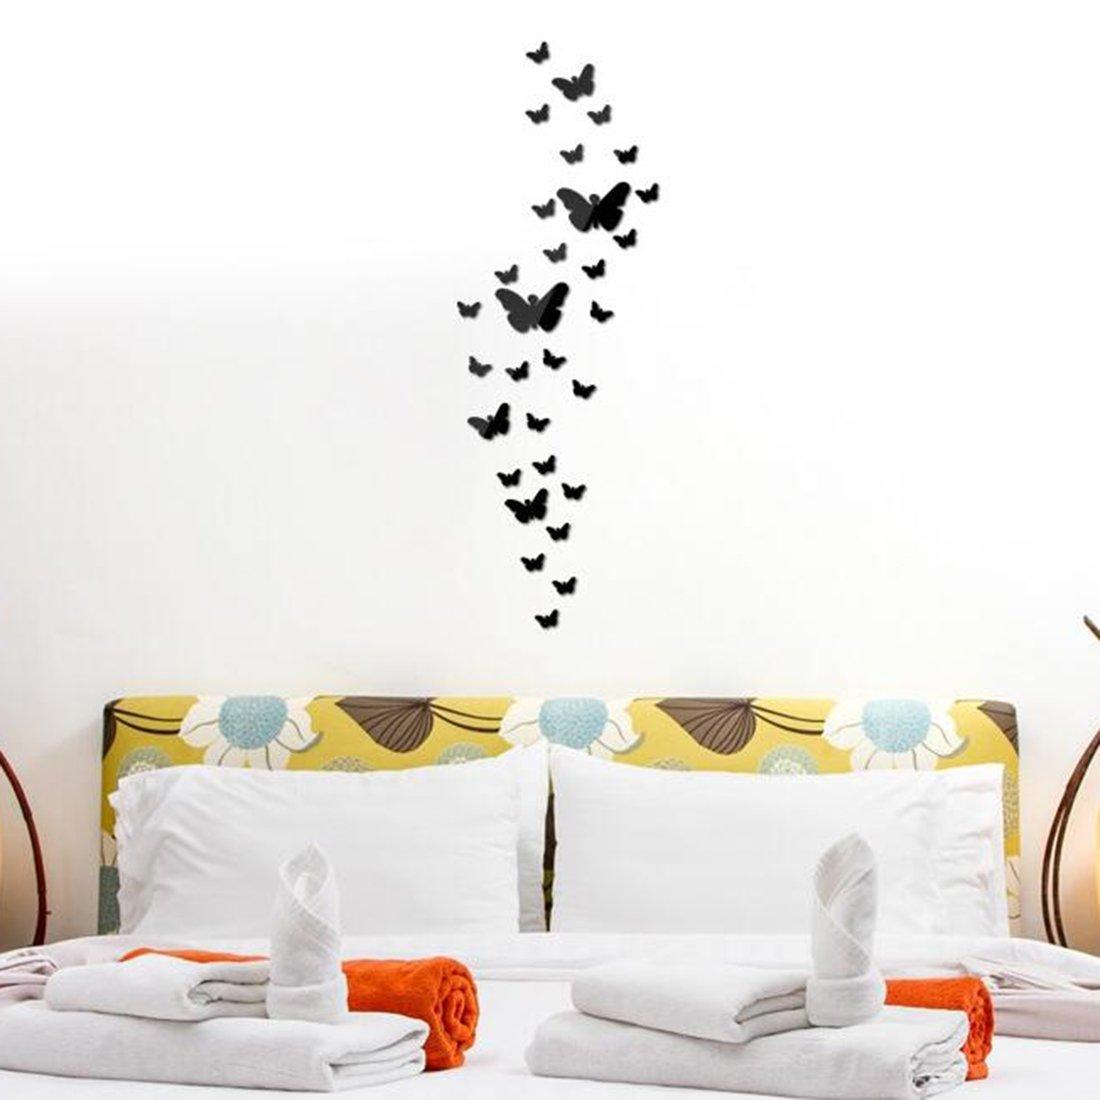 Декор стен бабочками своими руками: трафареты, материалы 907